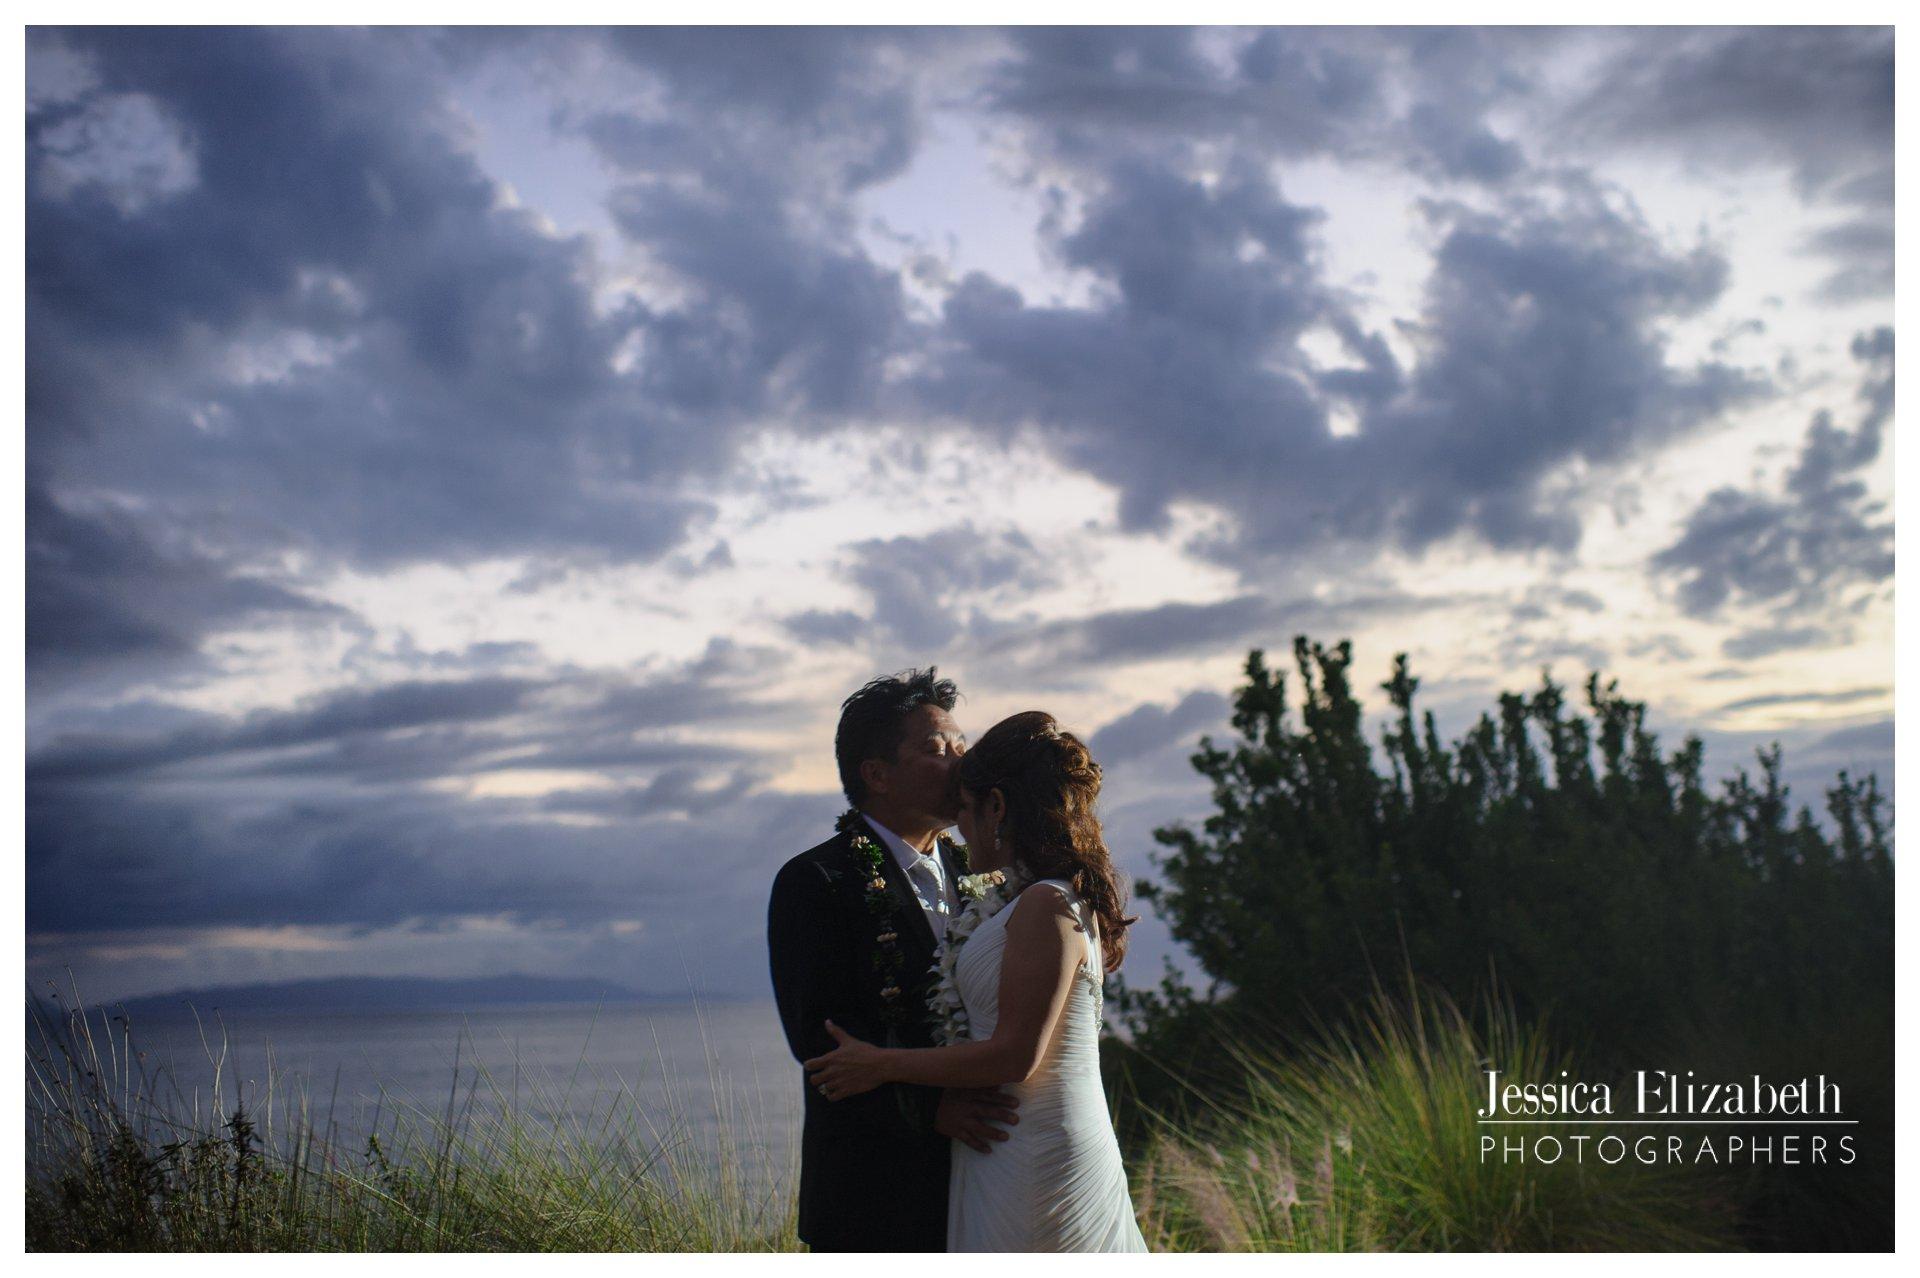 41-Terranea-Palos-Verdes-Wedding-Photography-by-Jessica-Elizabeth-w.jpg